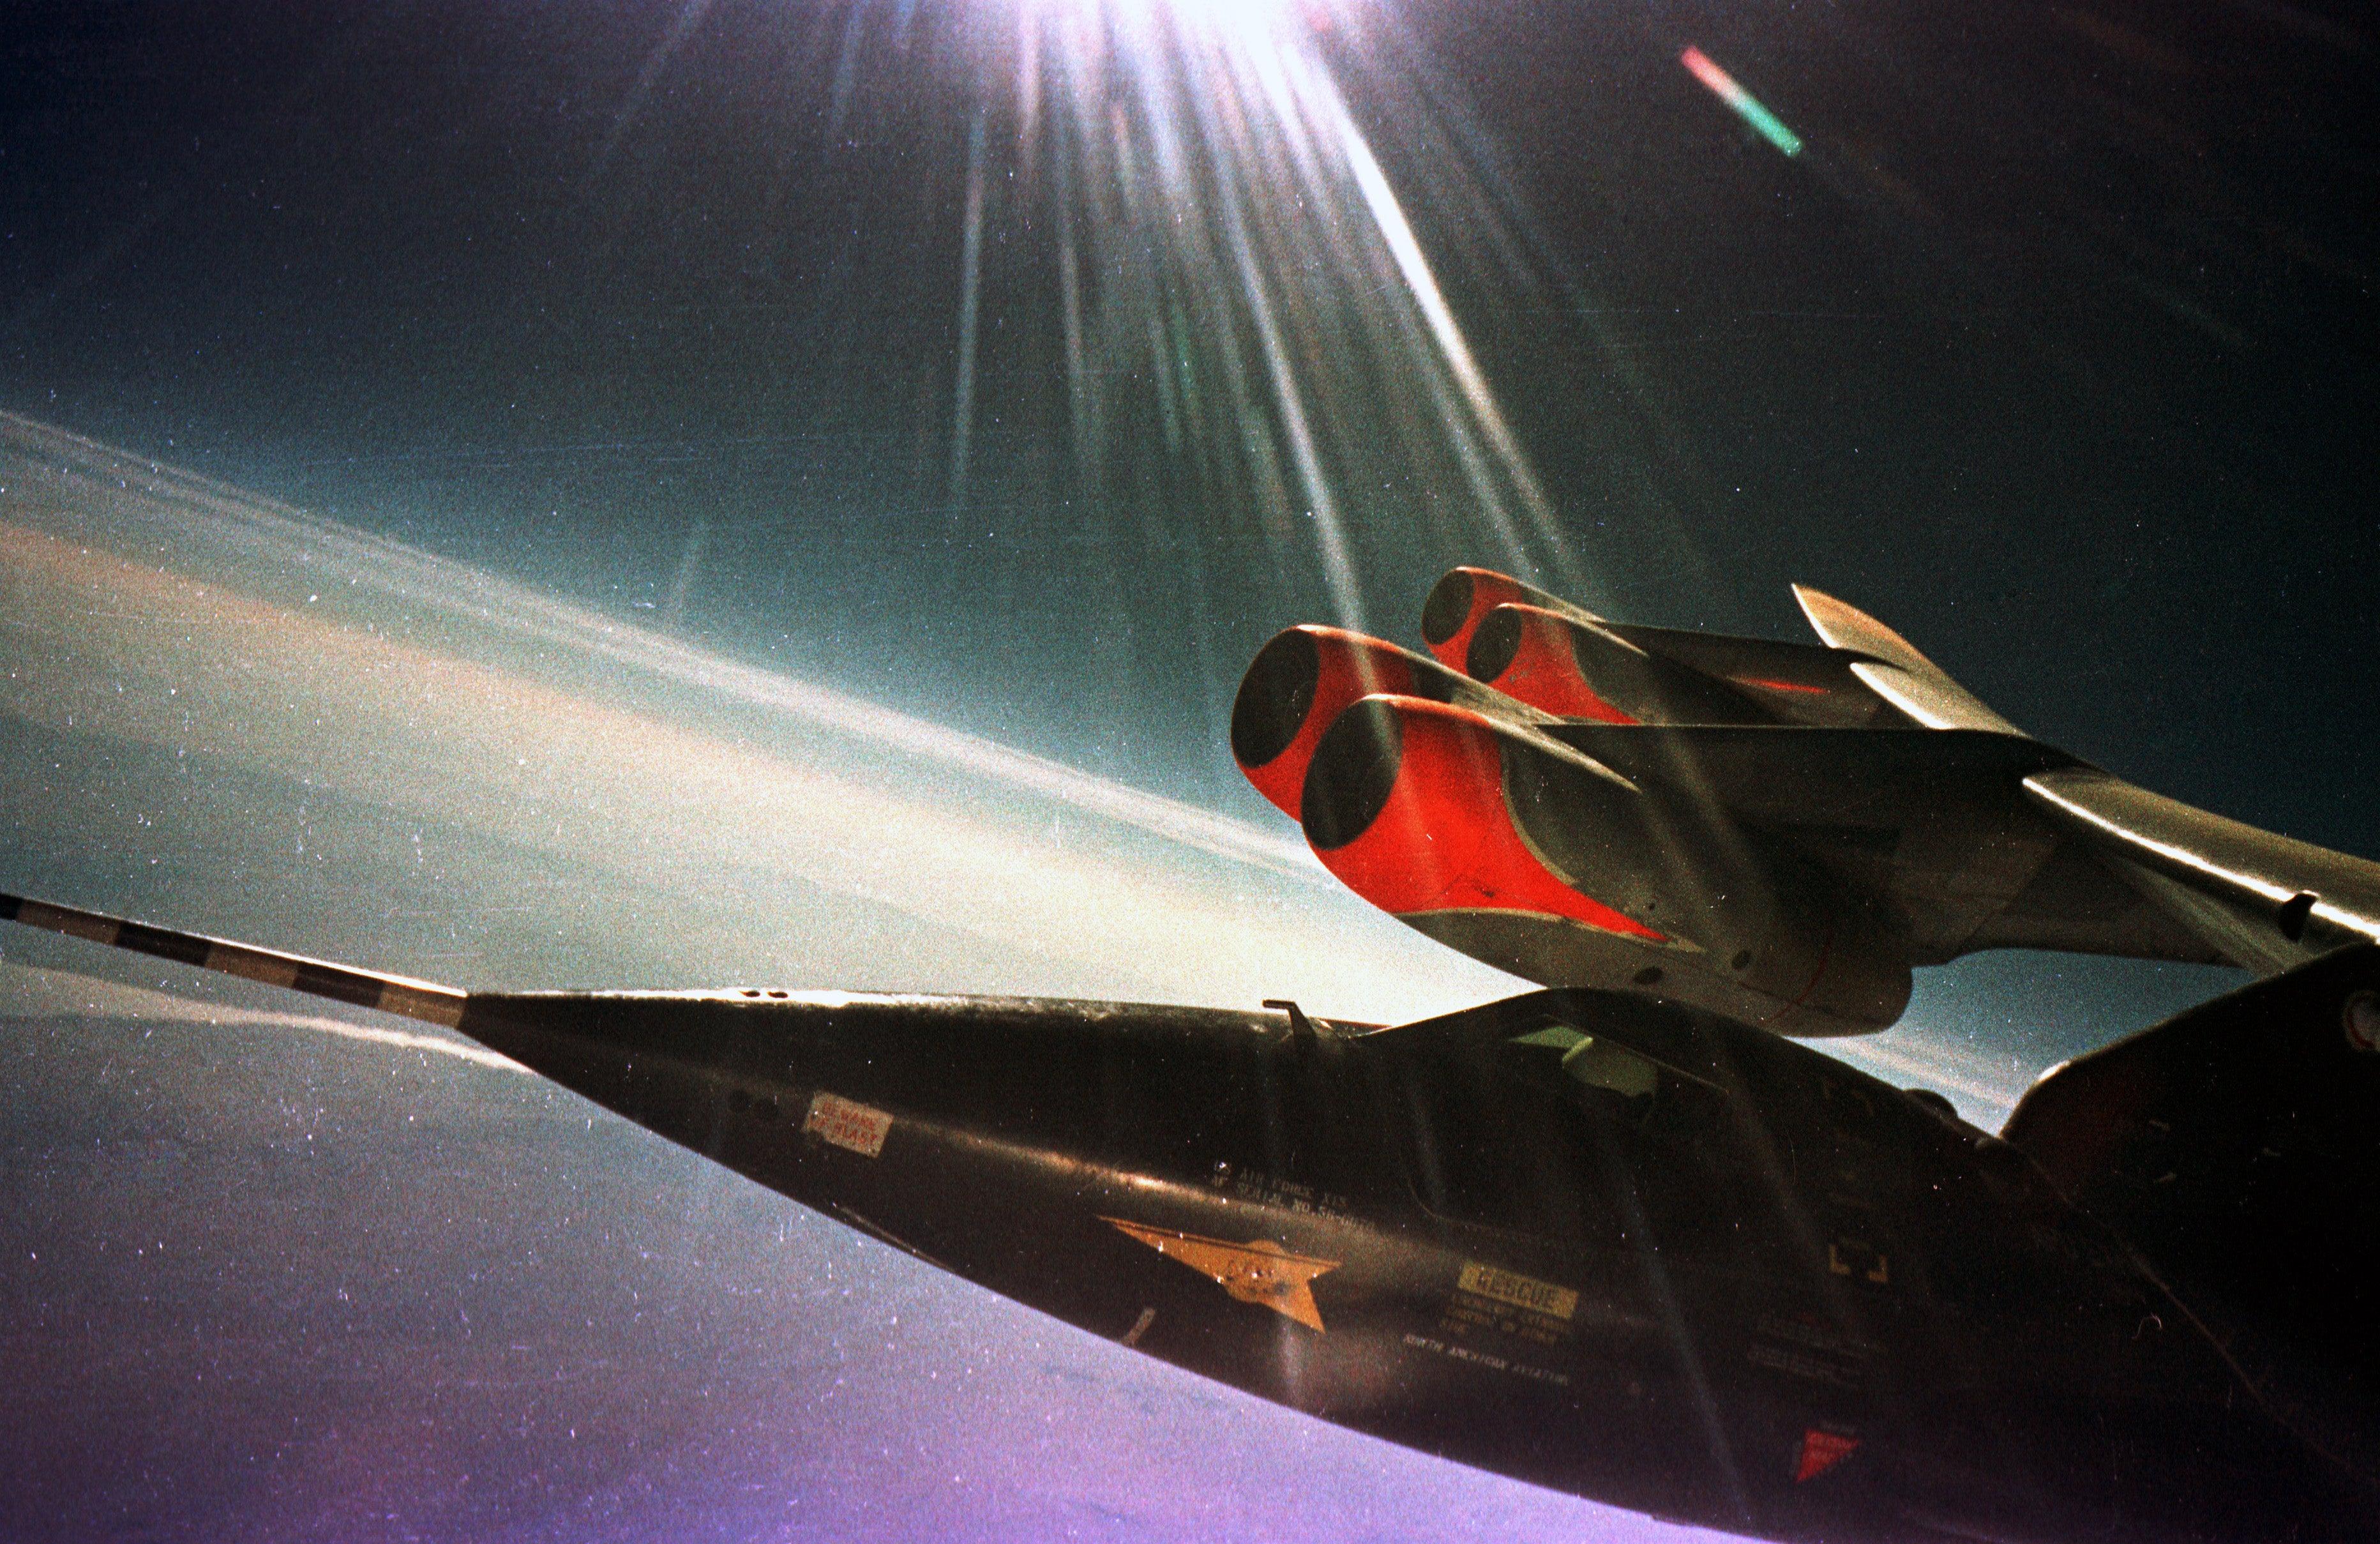 Mach 25 Speed In Mph Pvcsqgftldnlkbrb